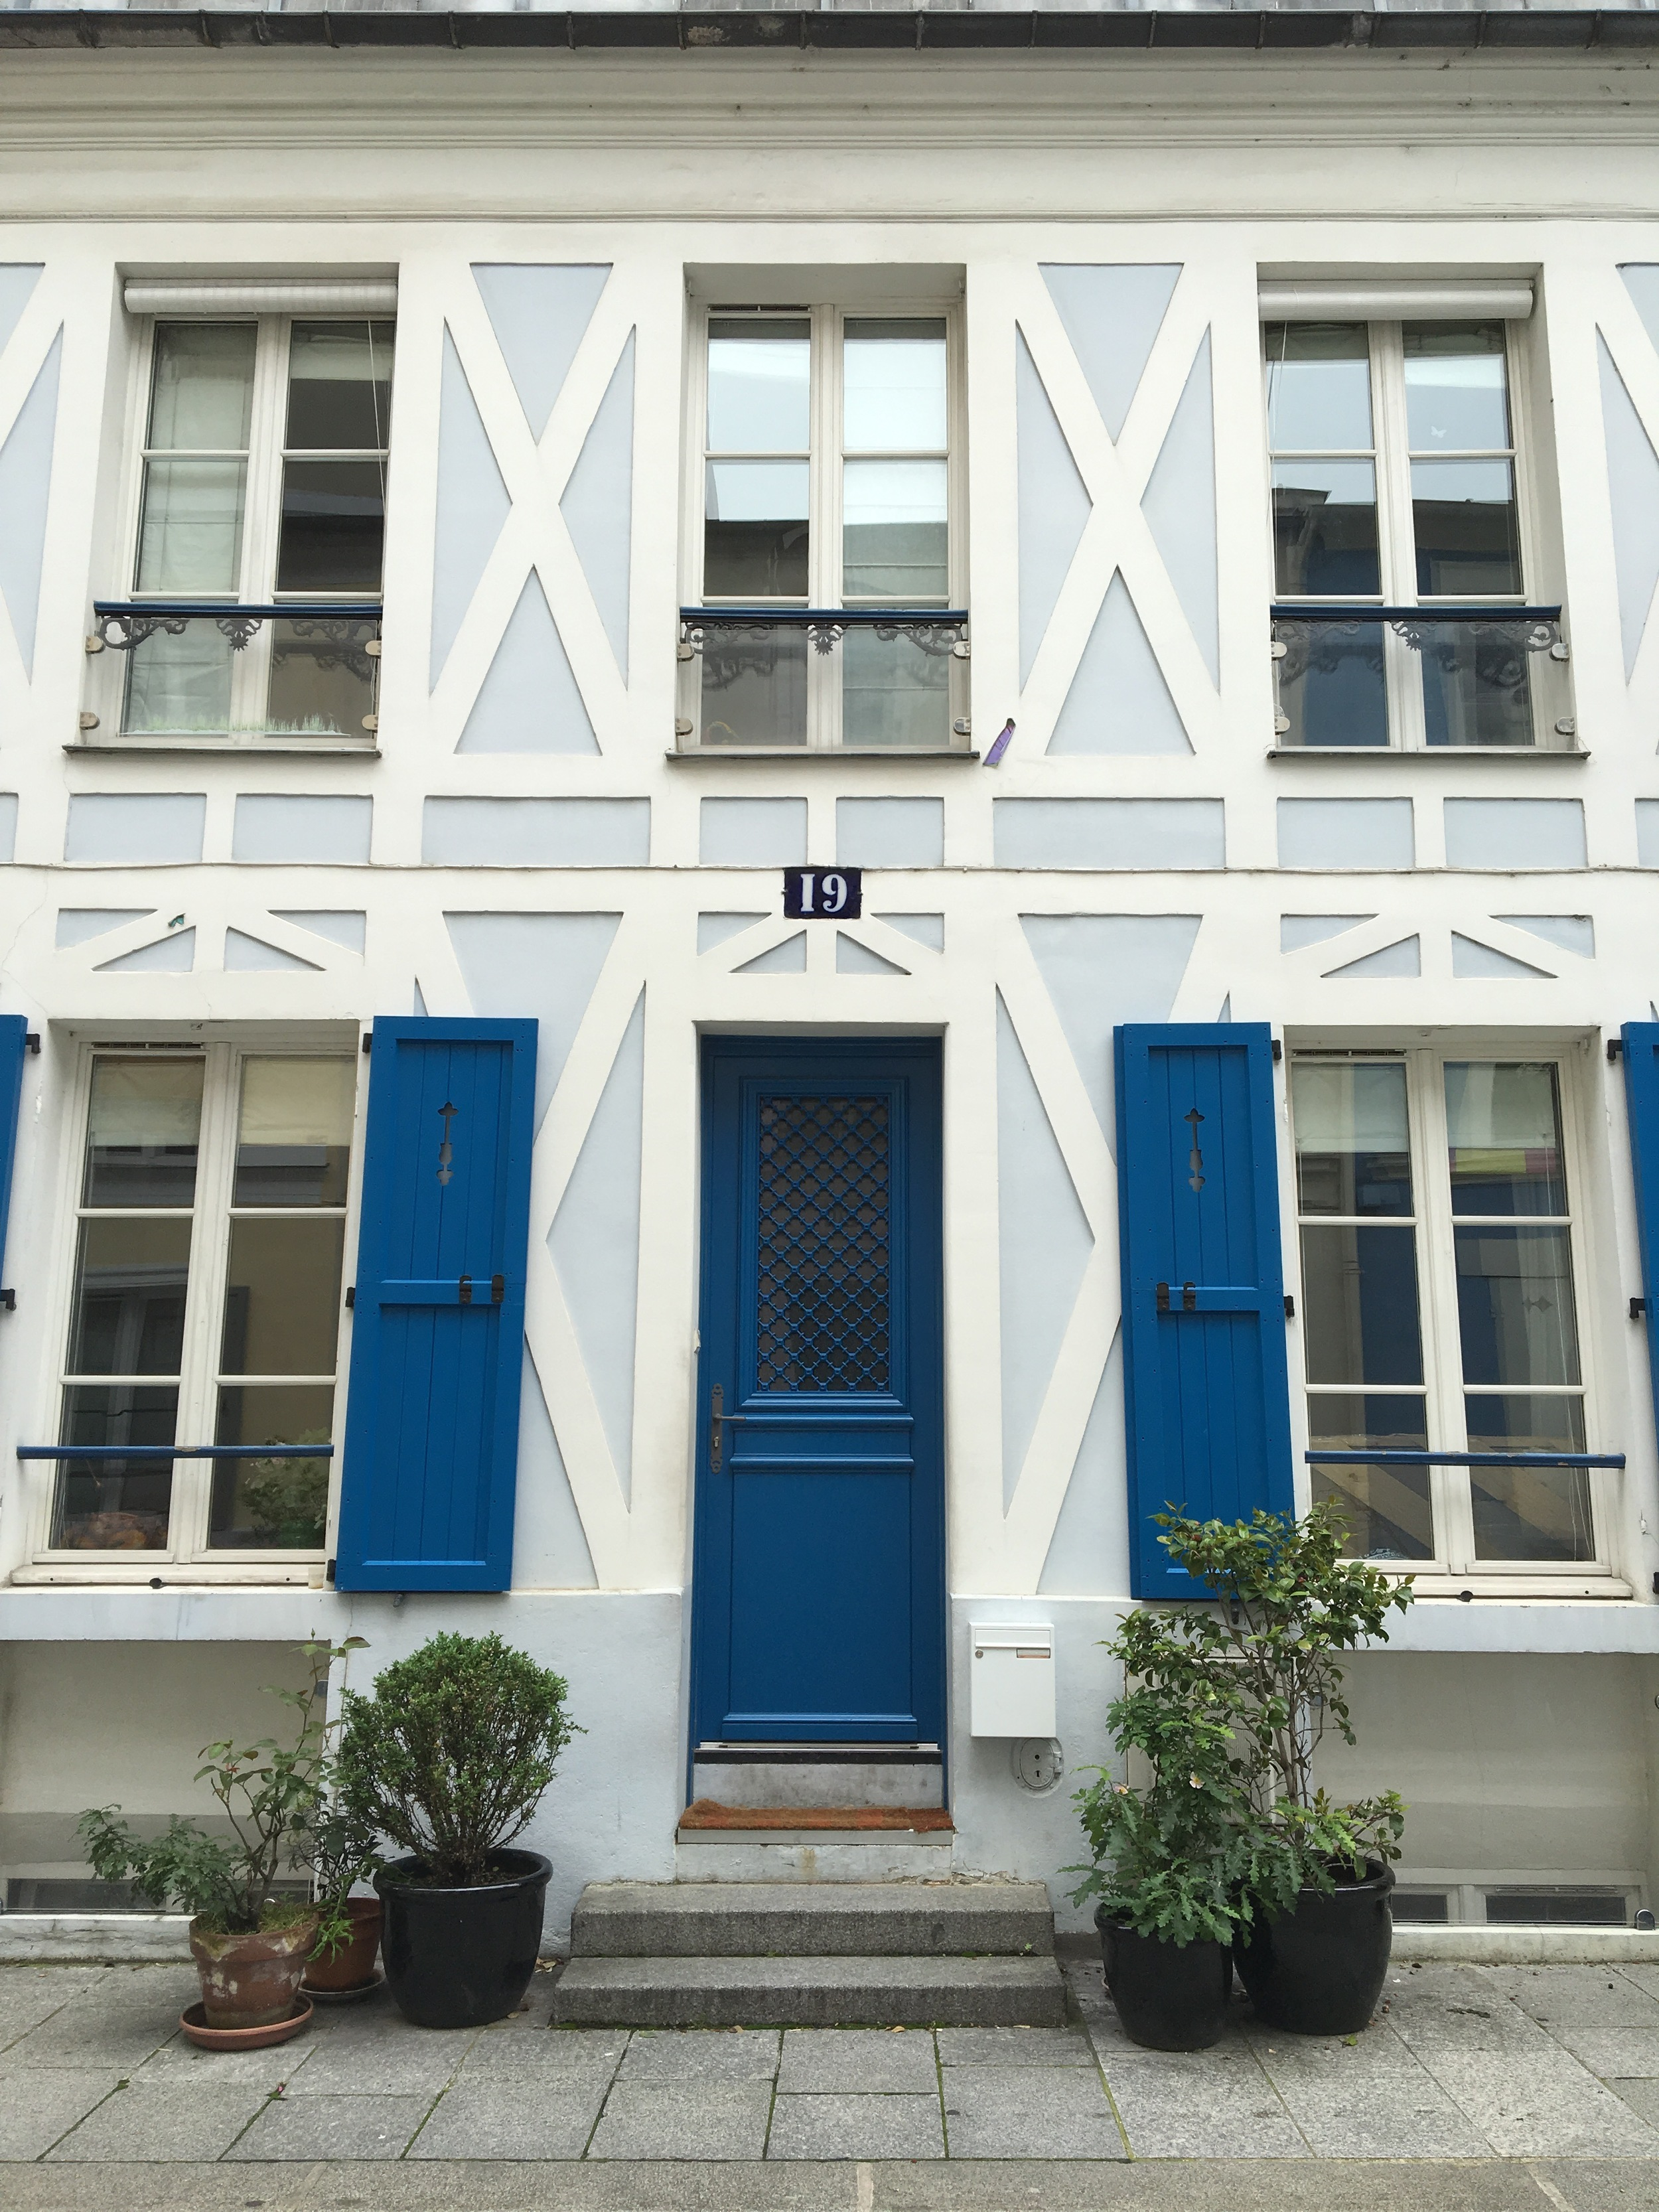 Dream house #3